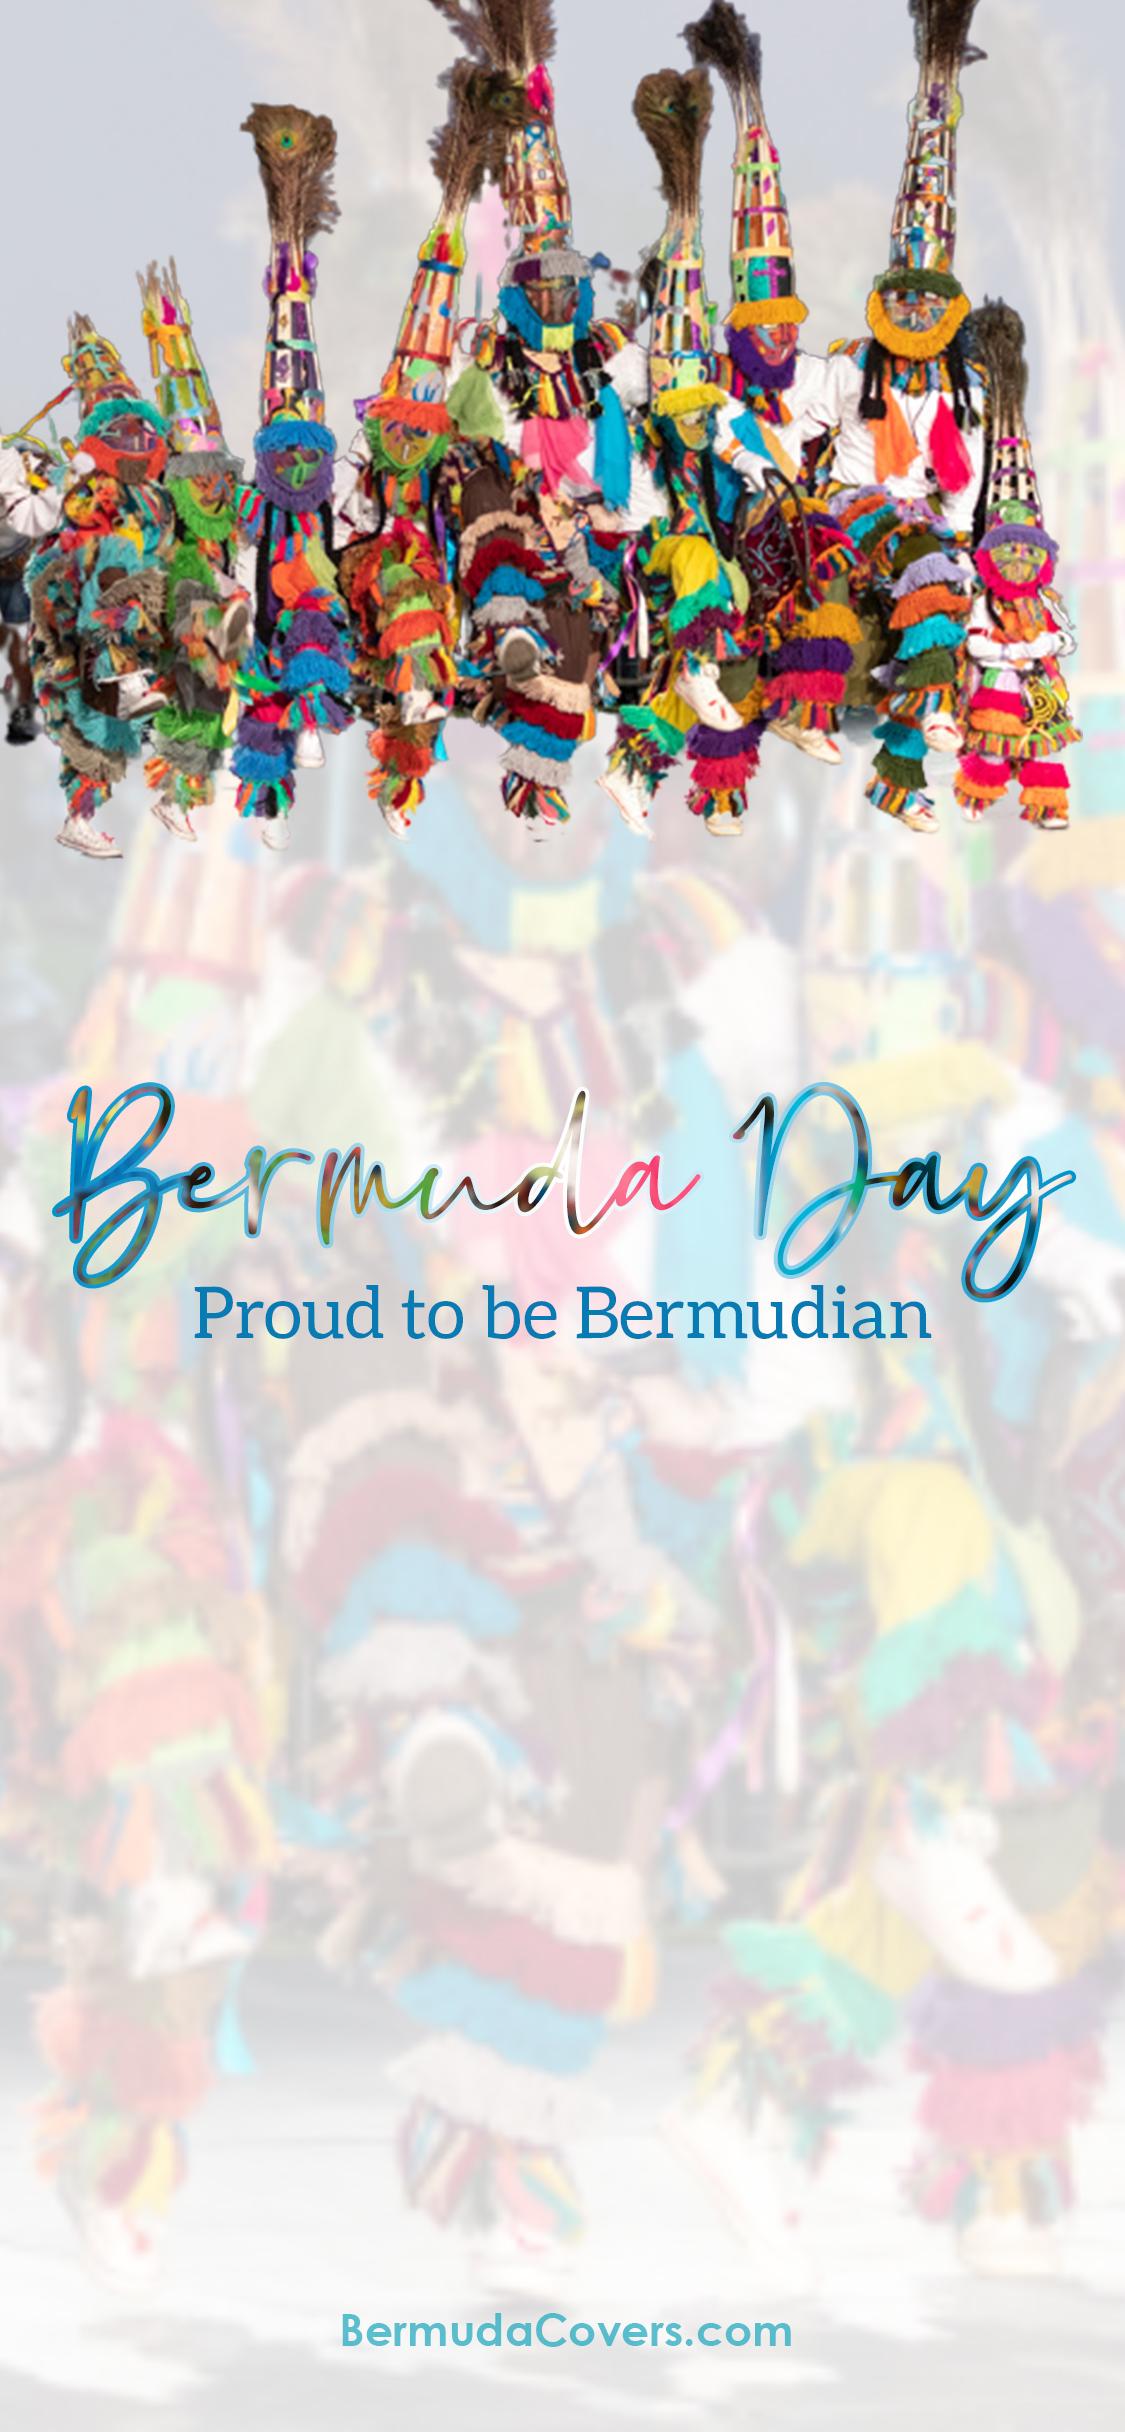 Phone Wallpaper Wednesday Bermuda Day Gombeys ETkpA3Lt 2